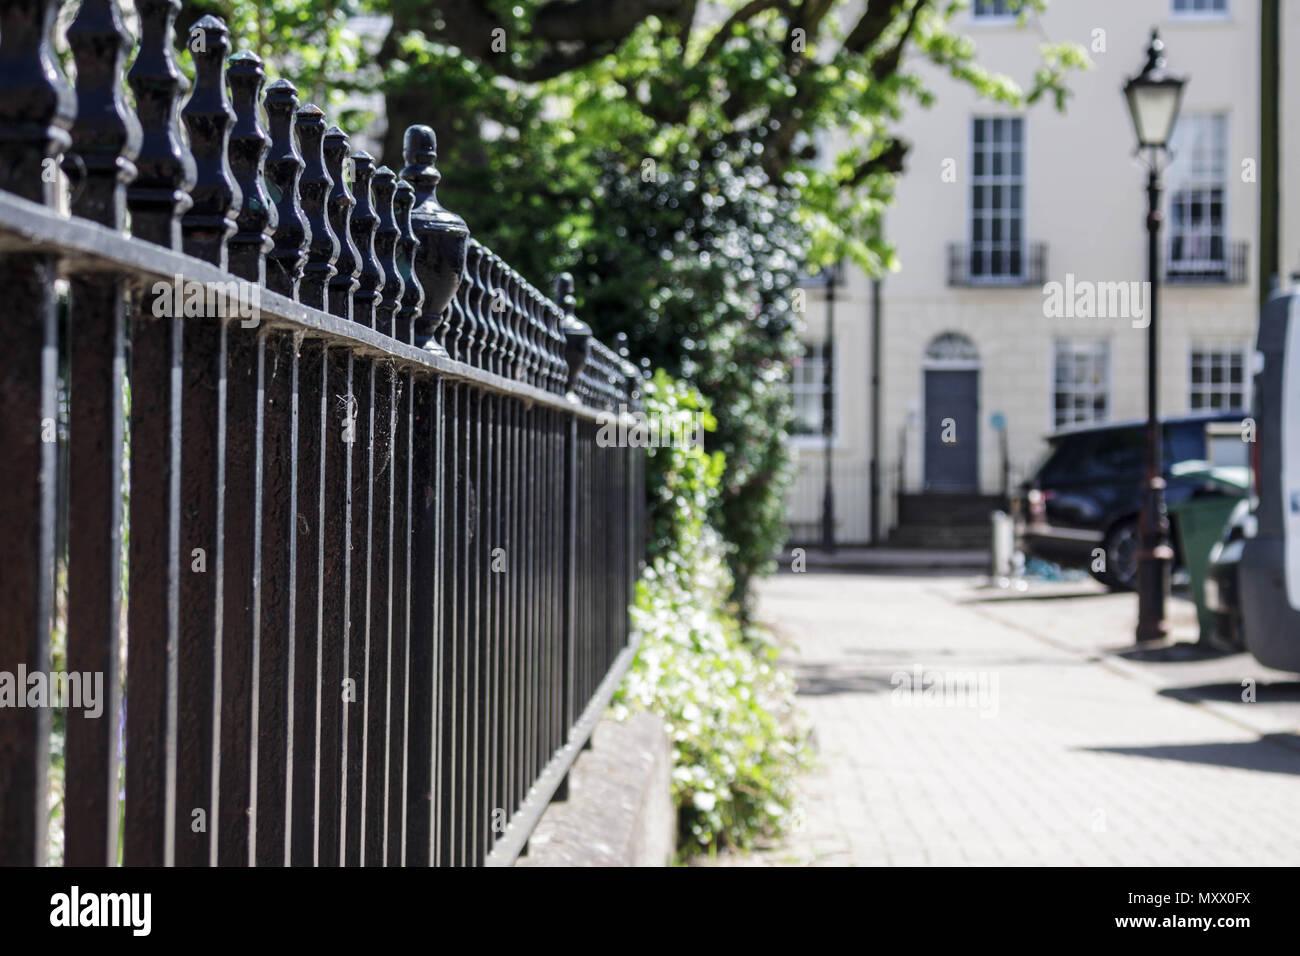 Street scene in a regency town in the UK. Image showing buildings, walls, shops, plants. Urban image. Stock Photo